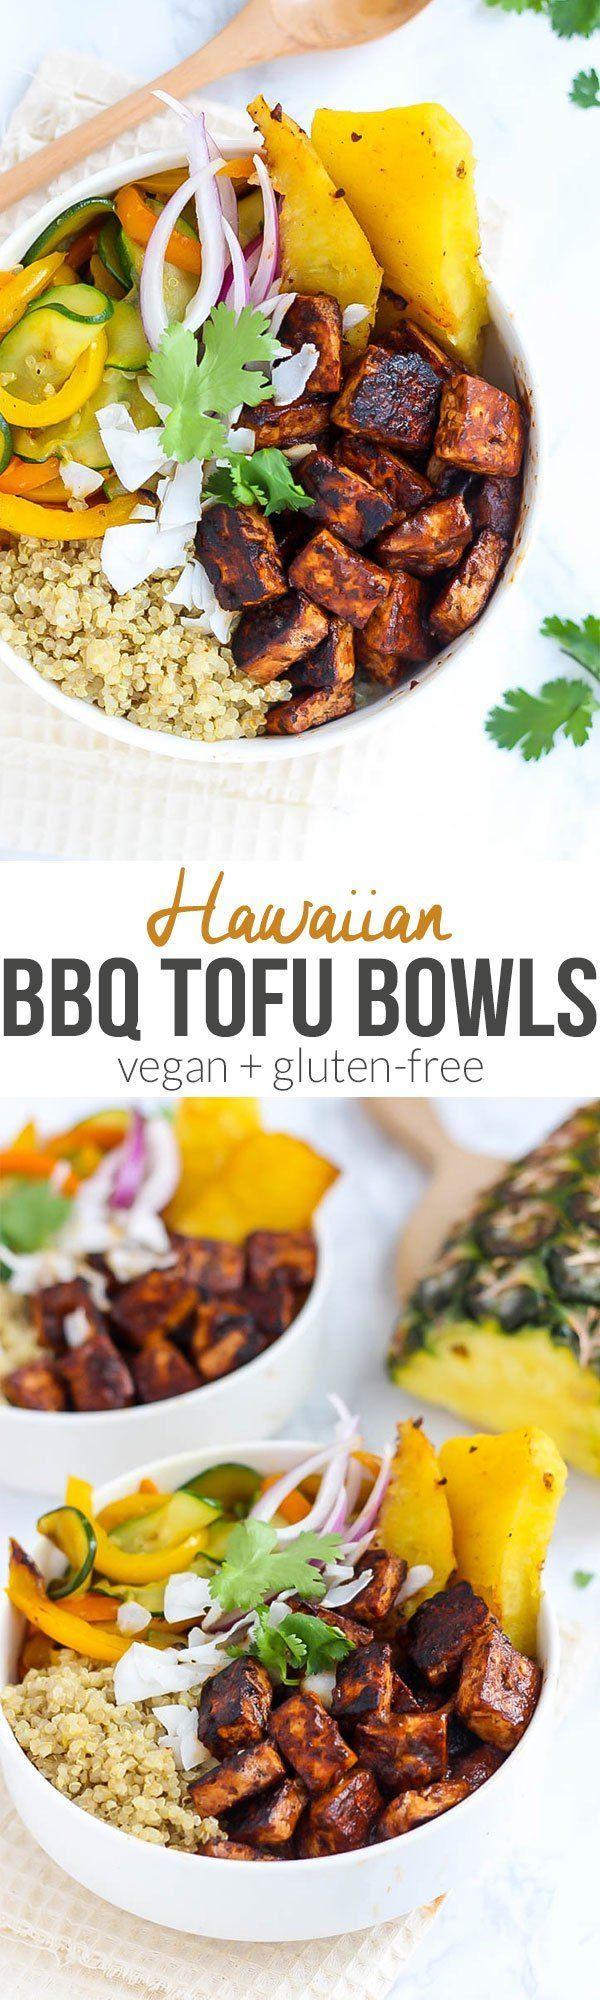 Vegan Hawaiian BBQ Tofu Bowls packed with flavor and crispy tofu!